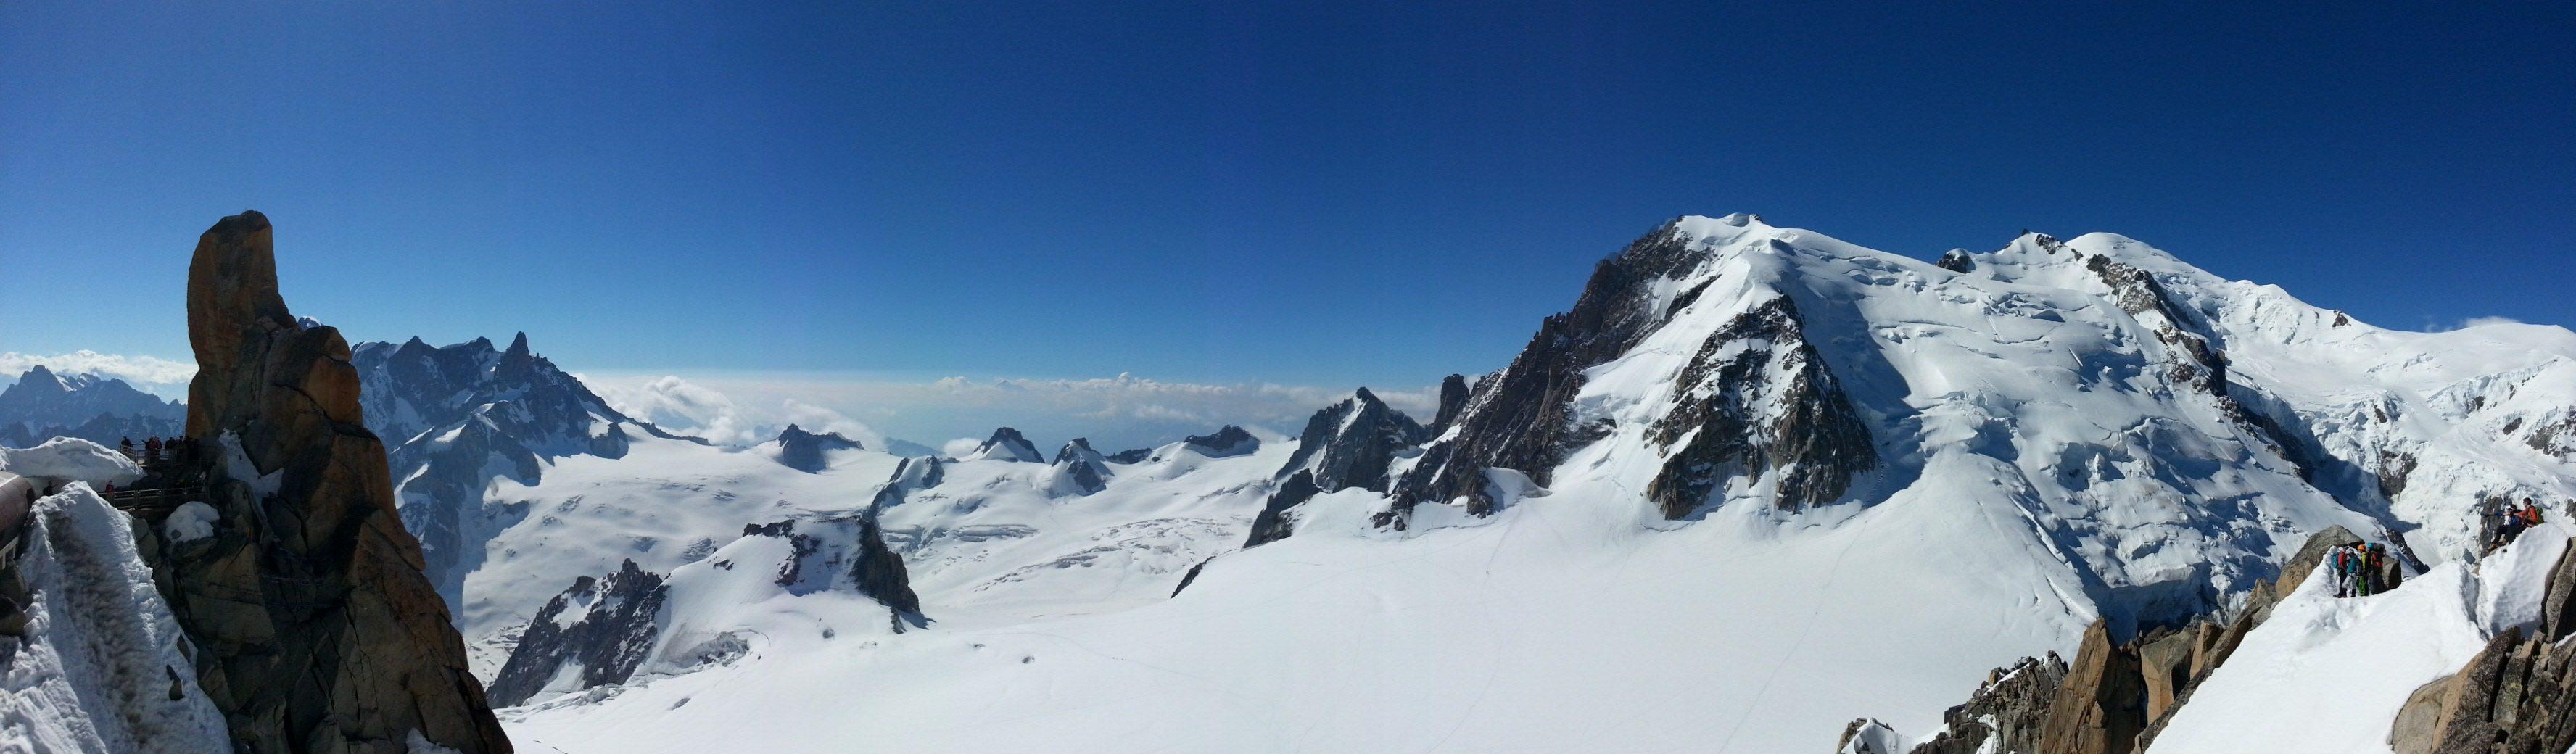 vue panoramique mont blanc pic du midi